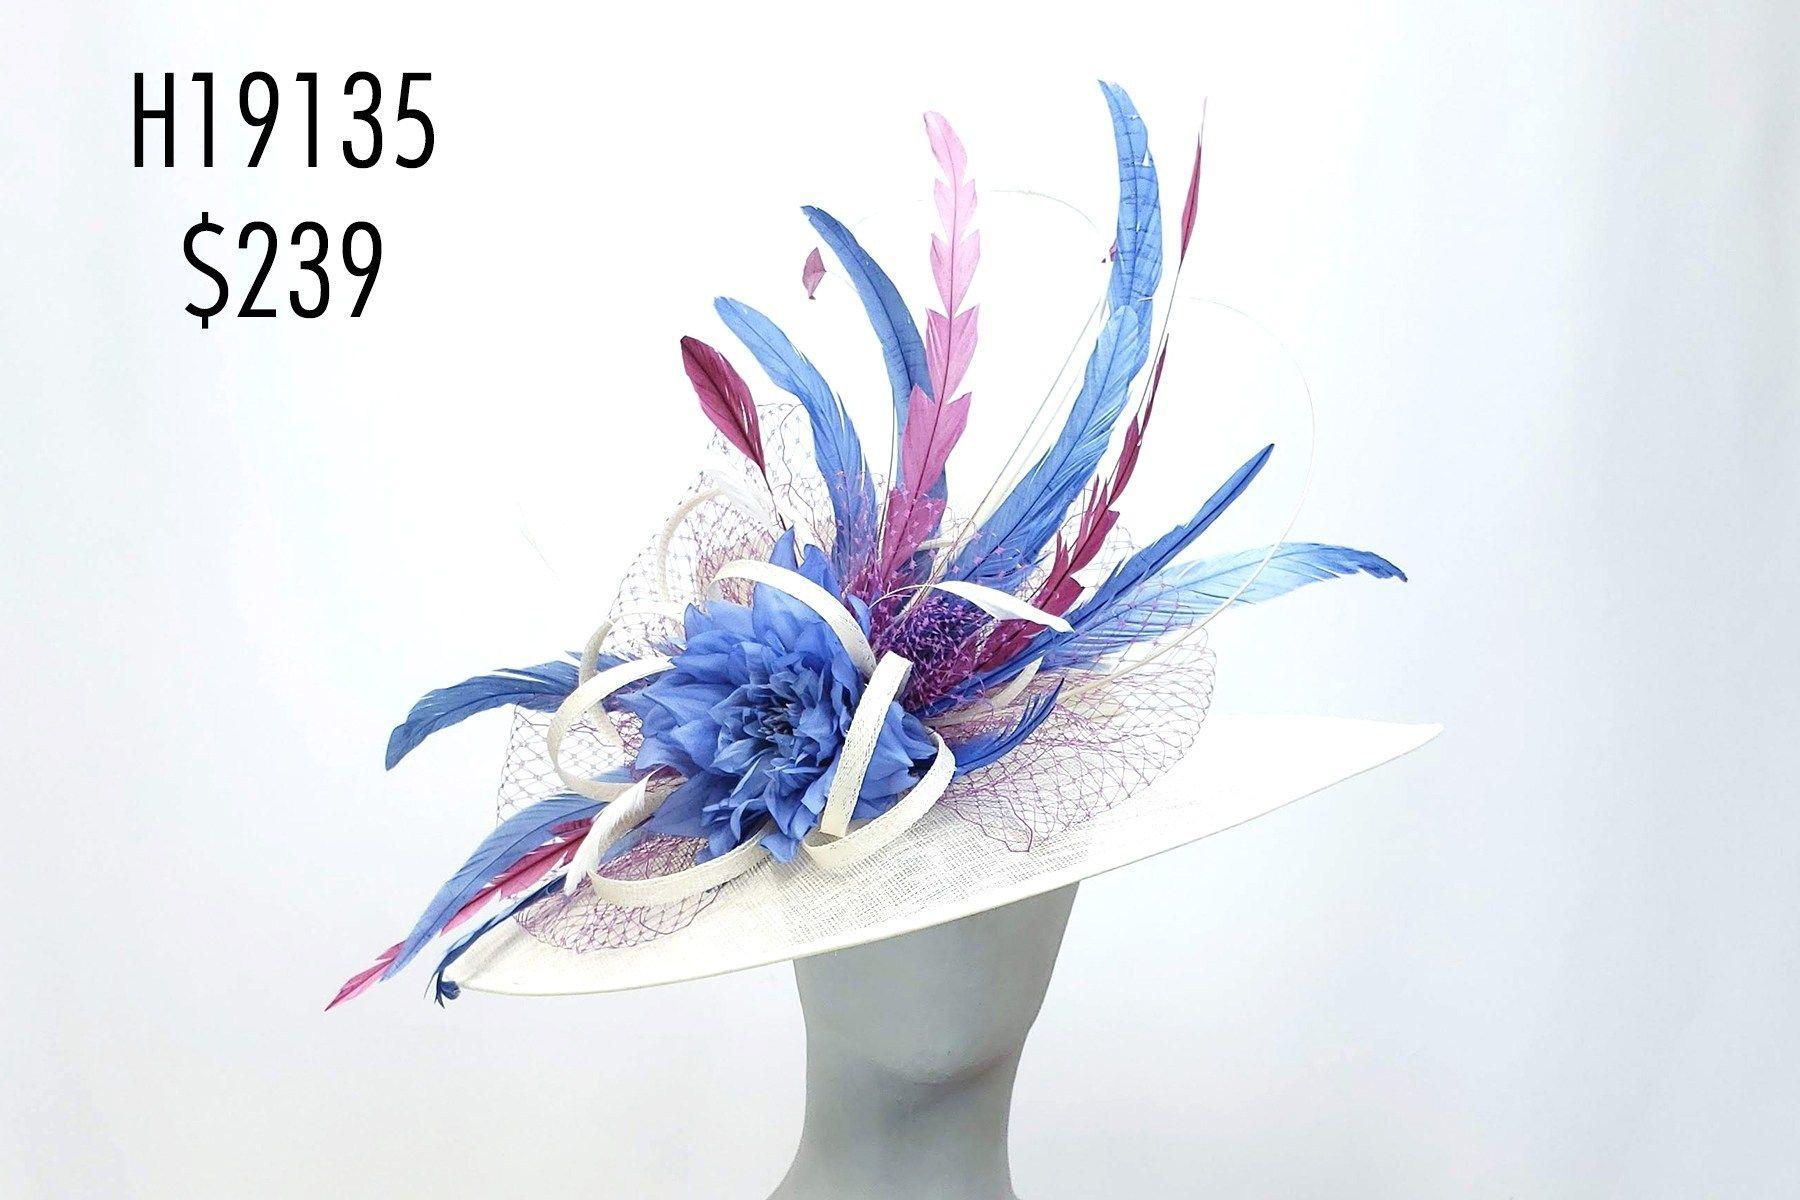 2019 Designer Collection Dee S Hats Designer Collection Design Hat Designs